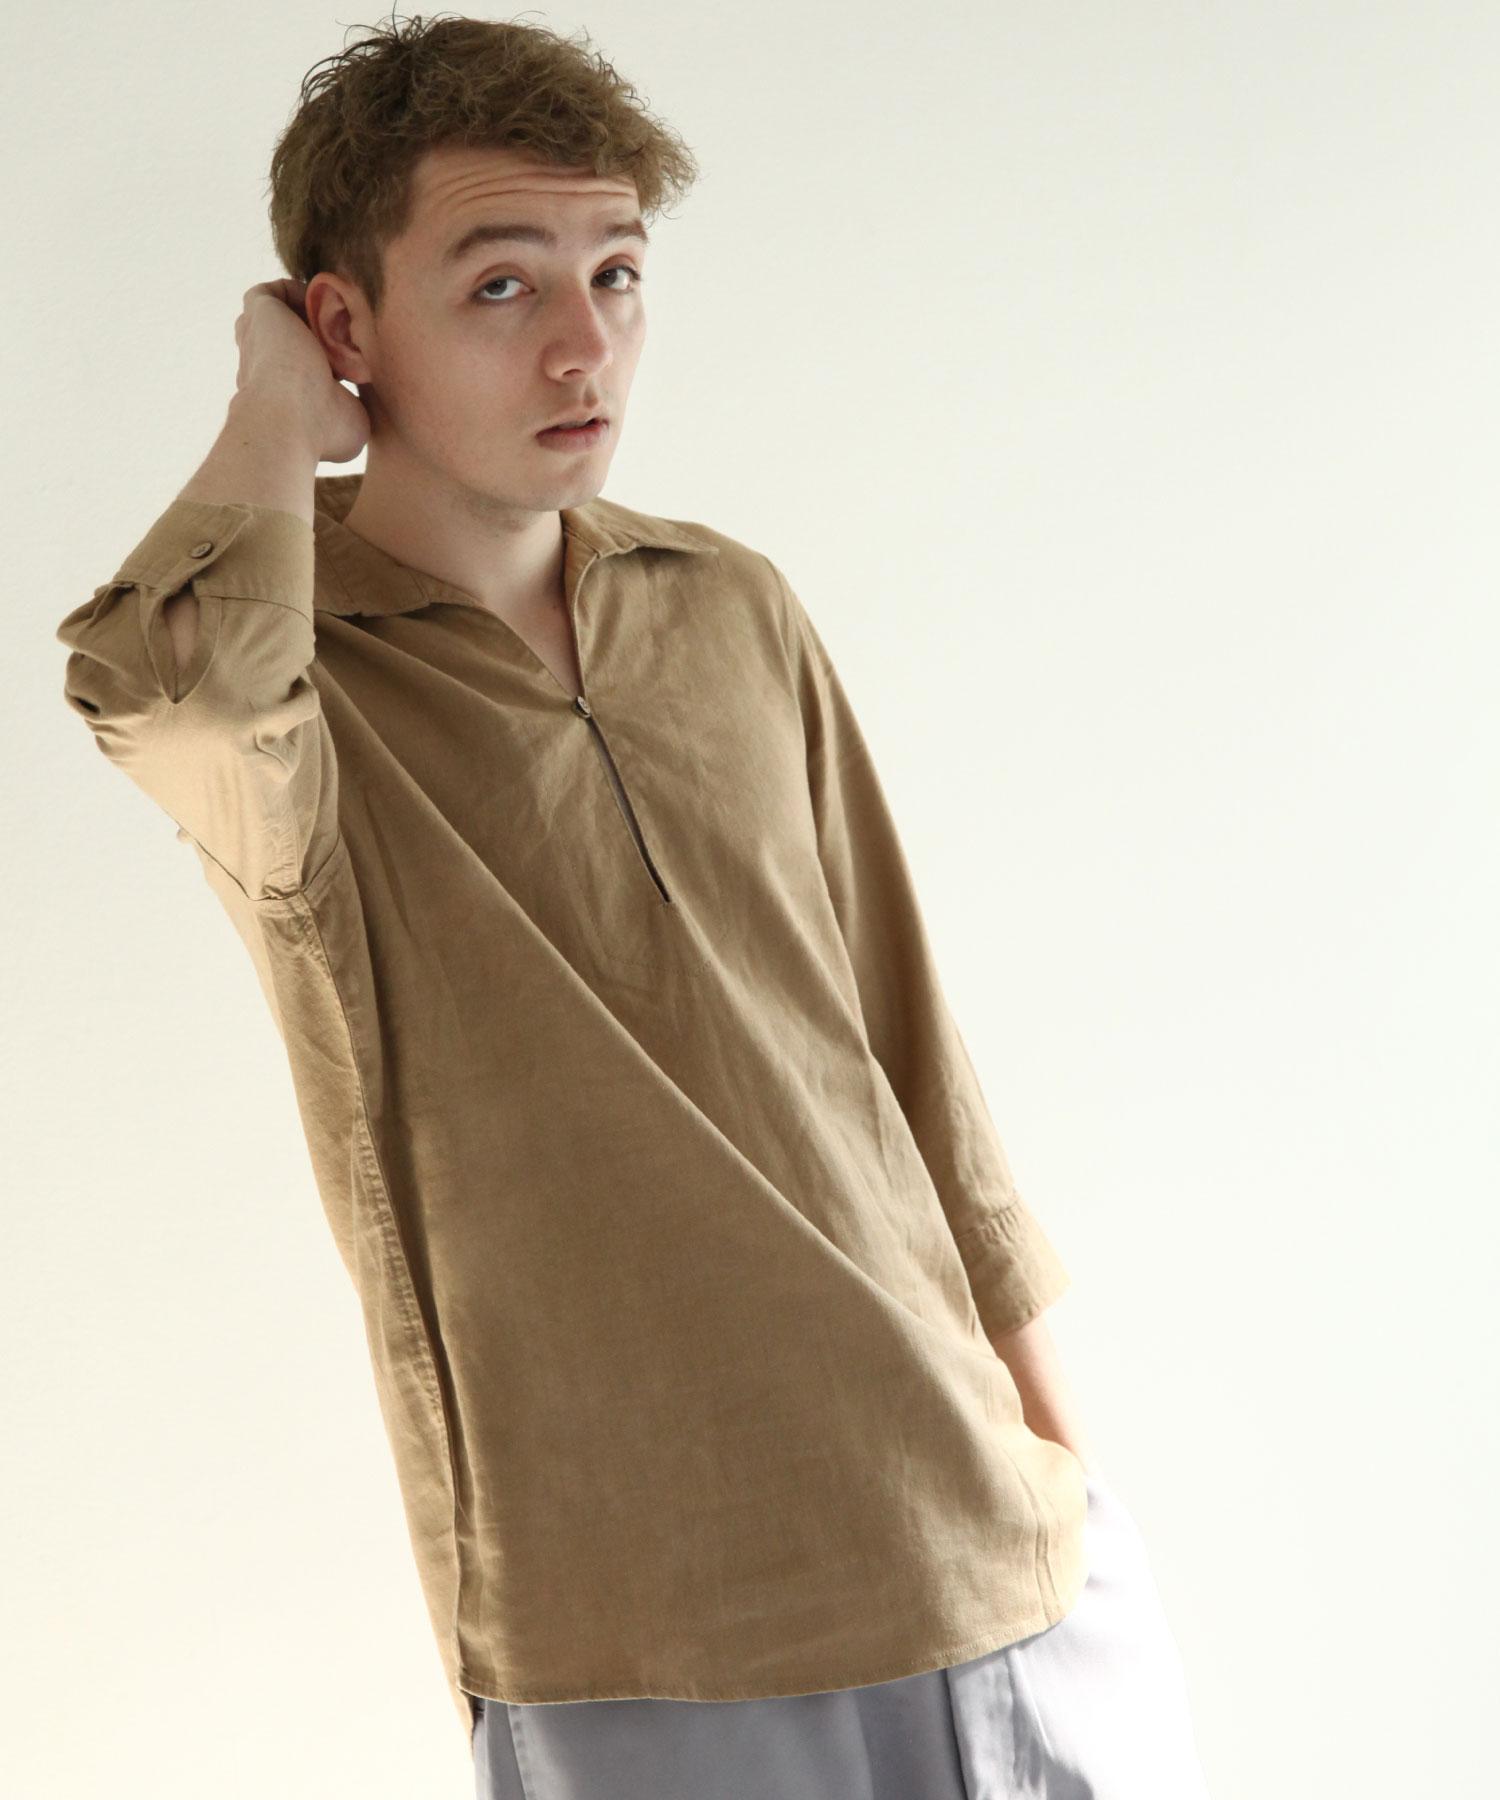 【Nilway】七分袖棉麻套頭衫 1